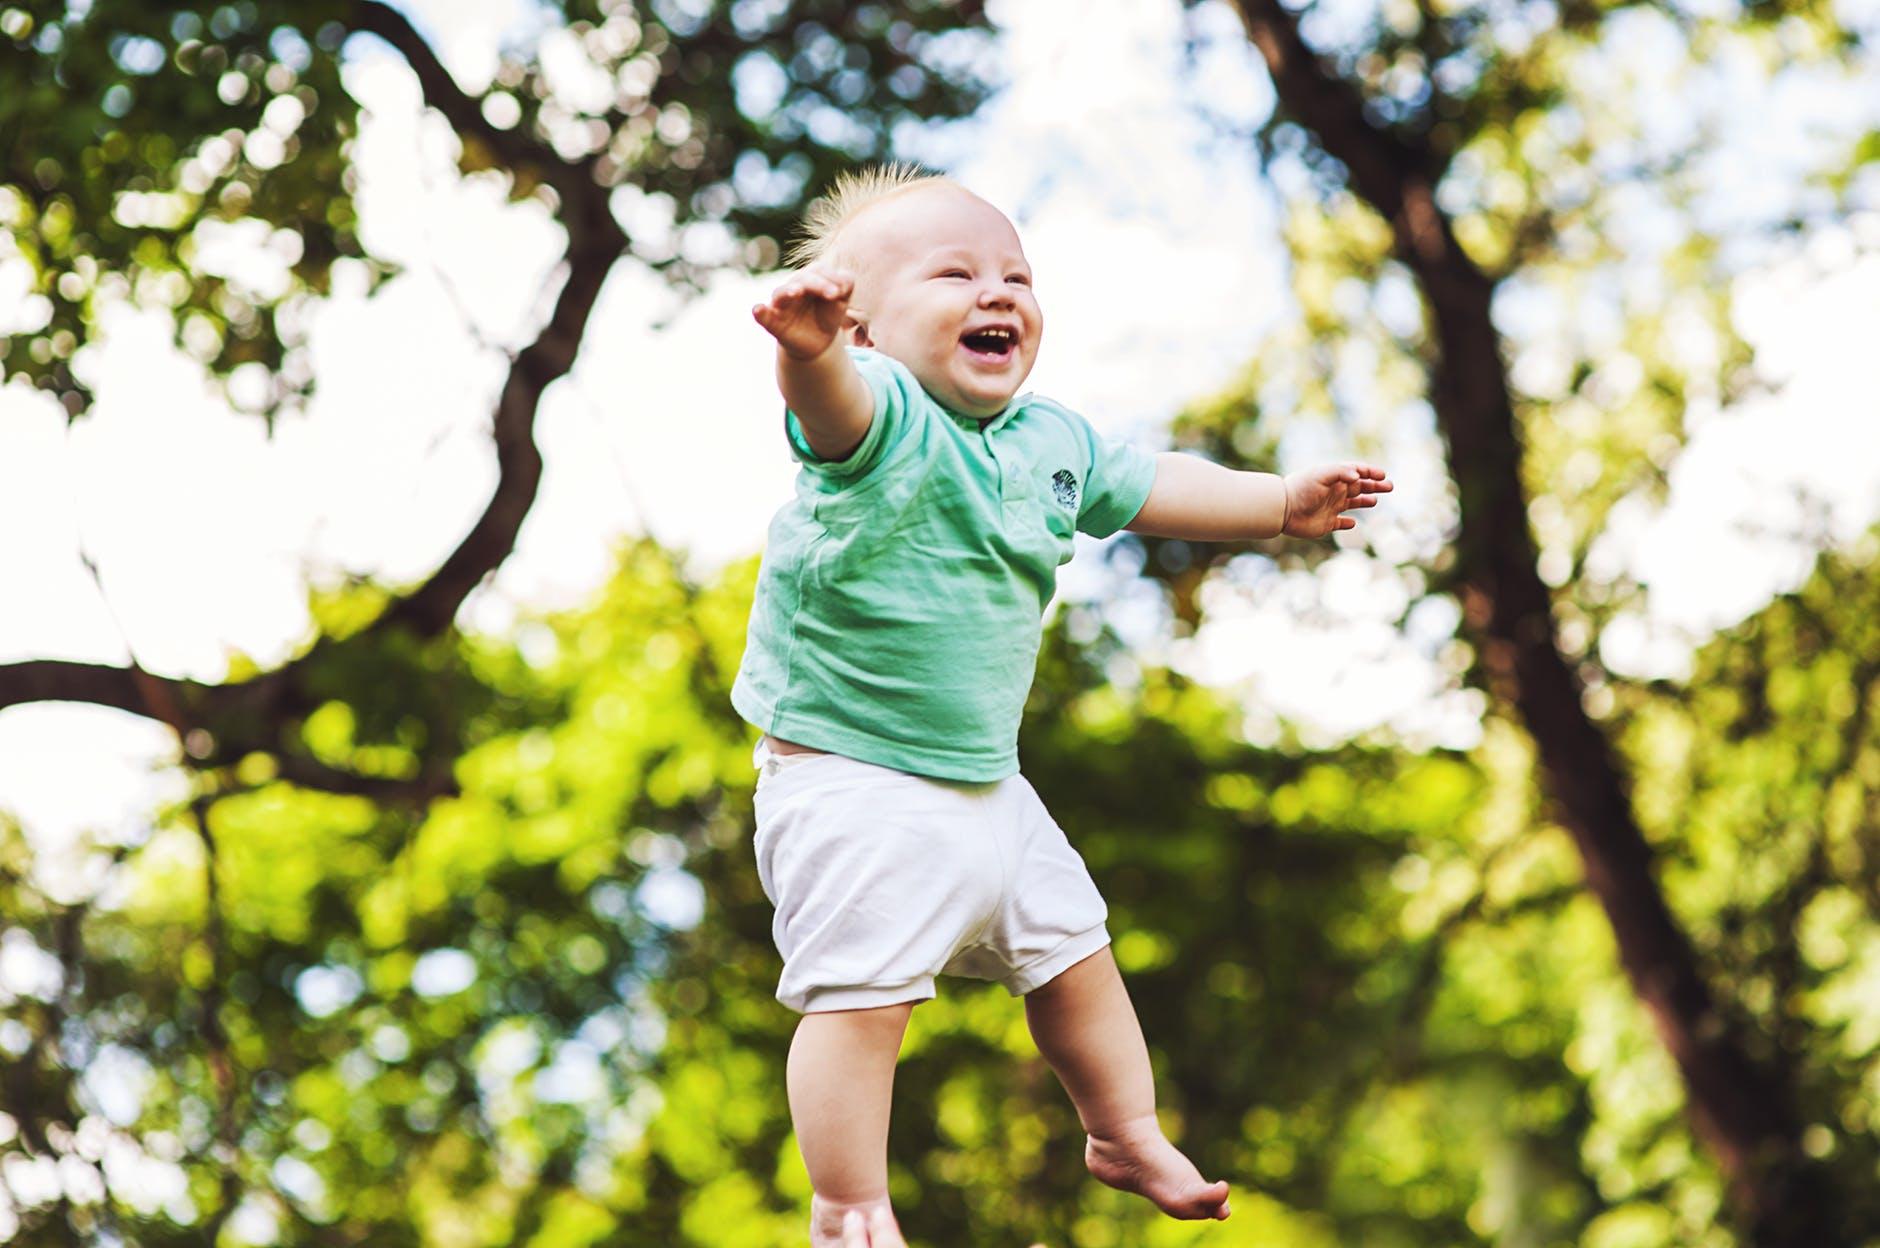 Niño bailando en granja escuela albitana